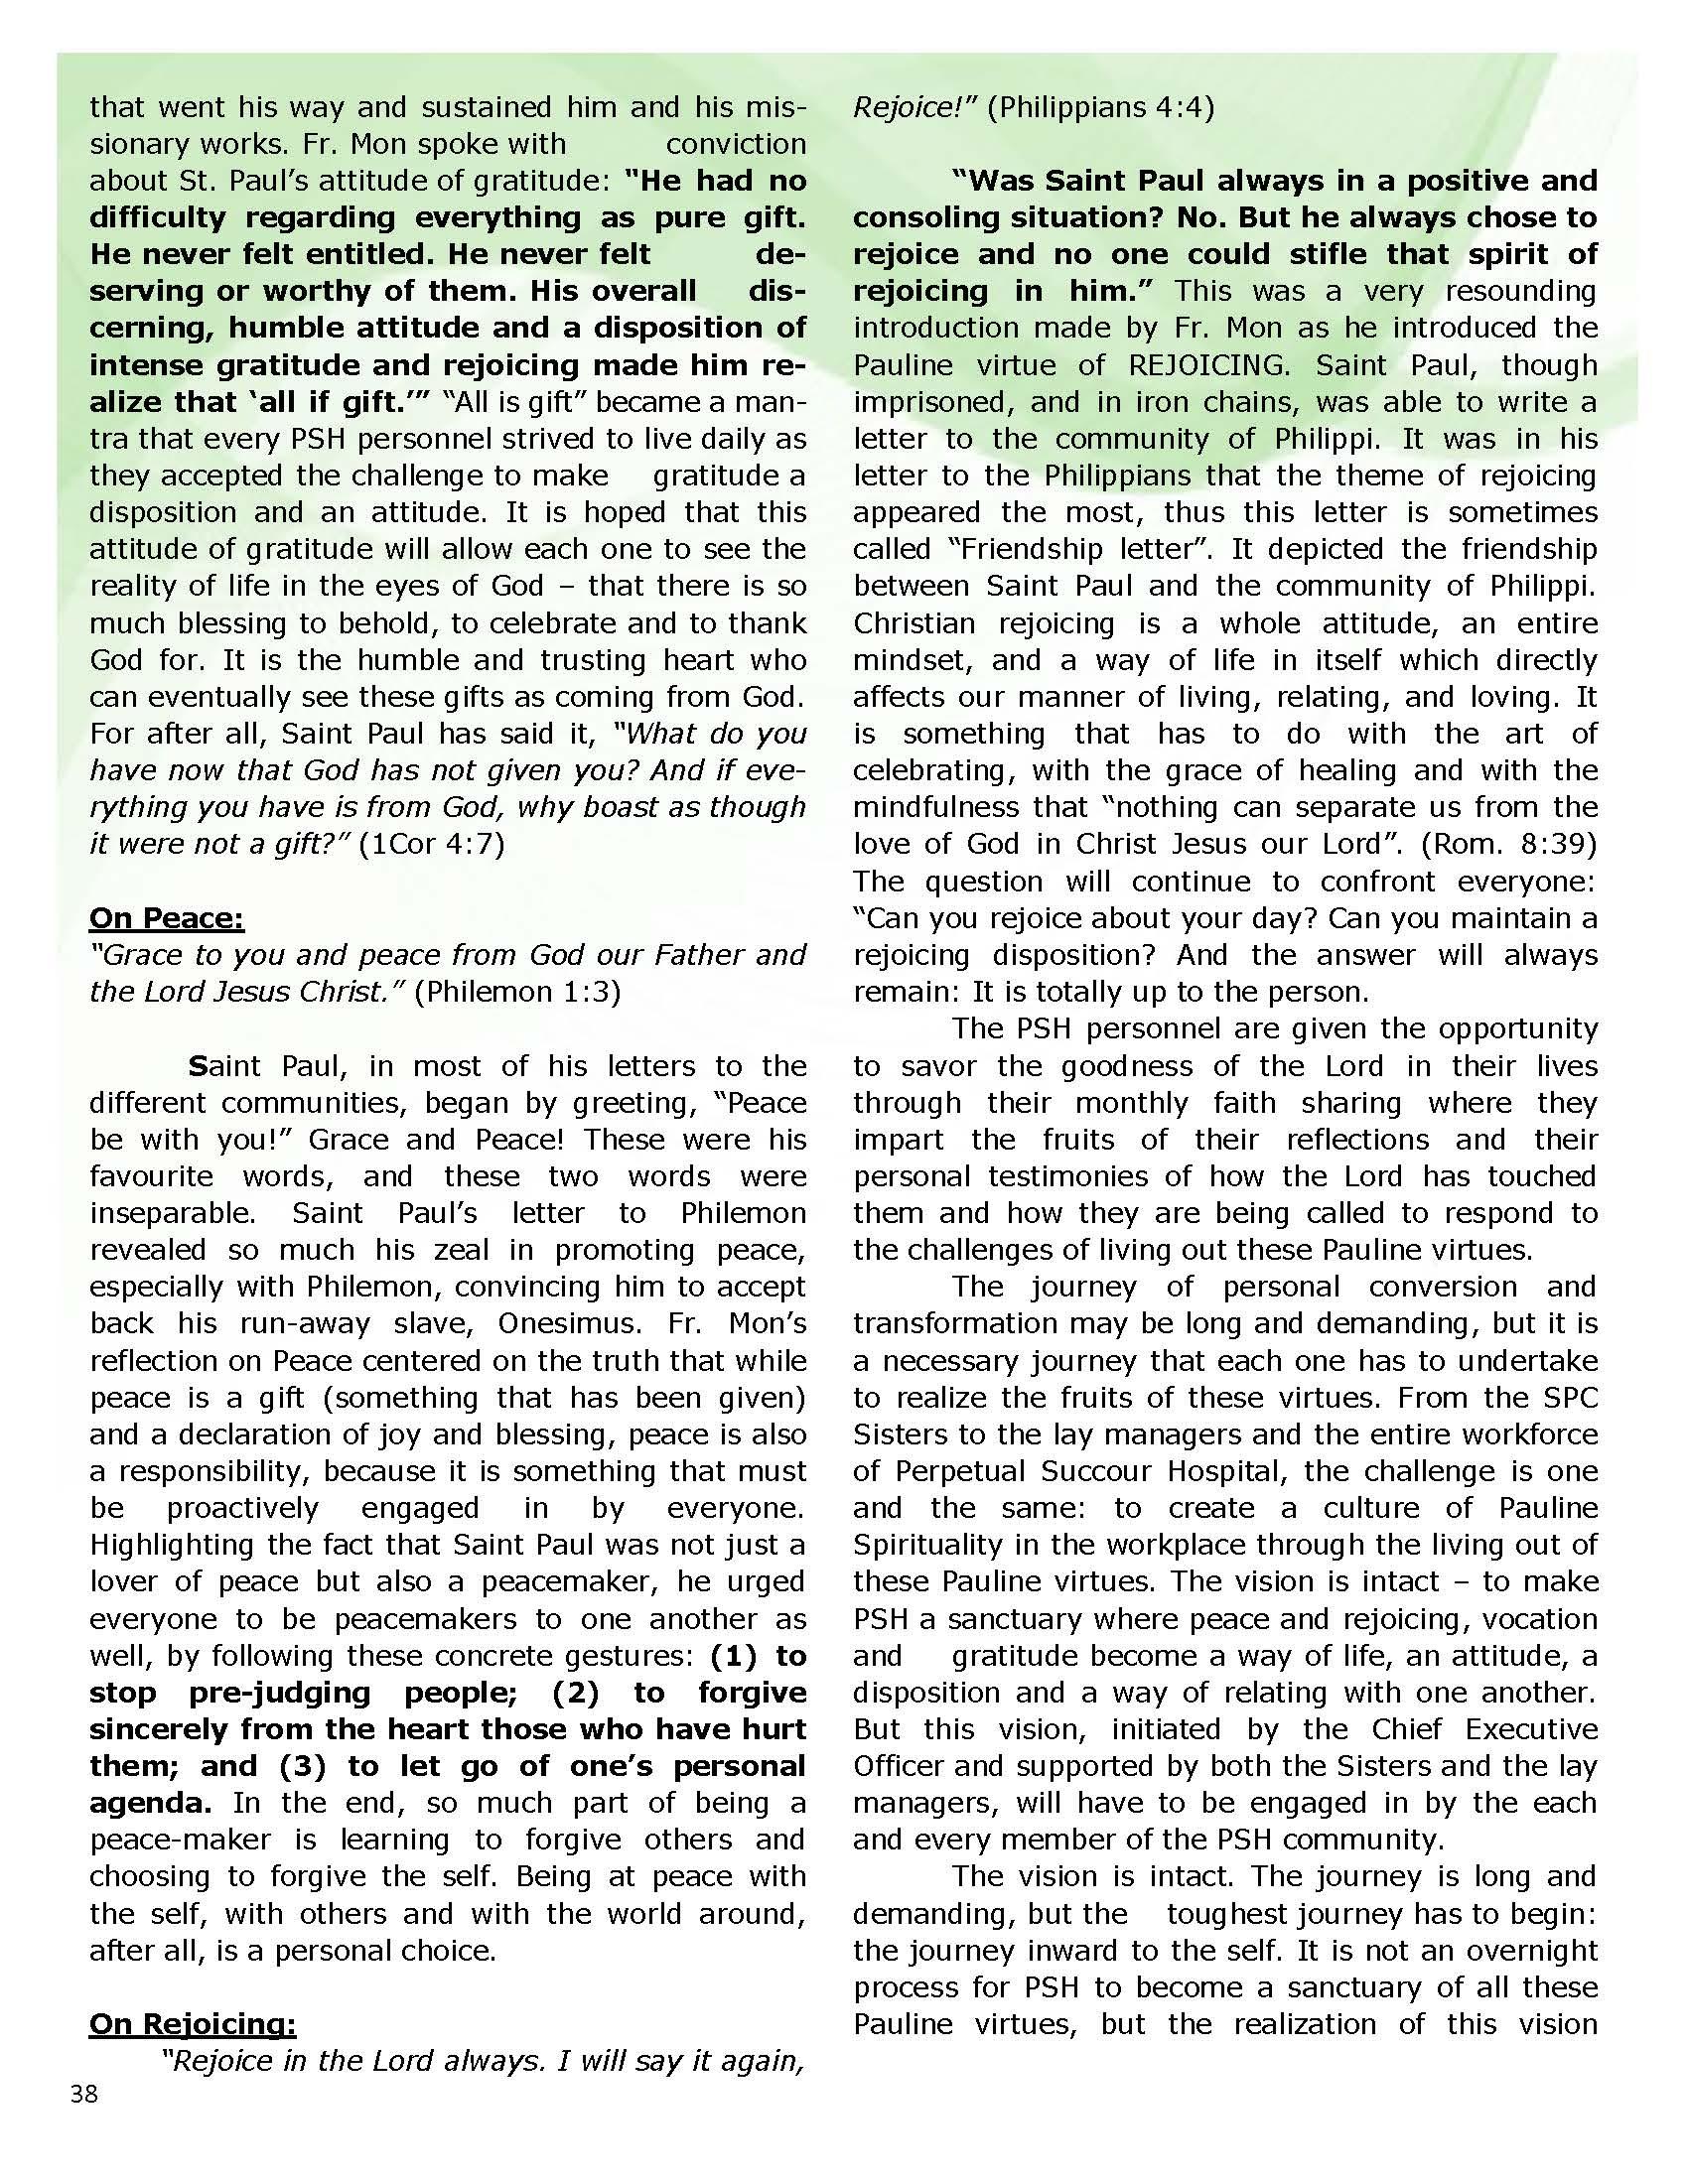 FINAL_TRAILBLAZER_volume 3_part1.pub2.pub_December5a_Page_38